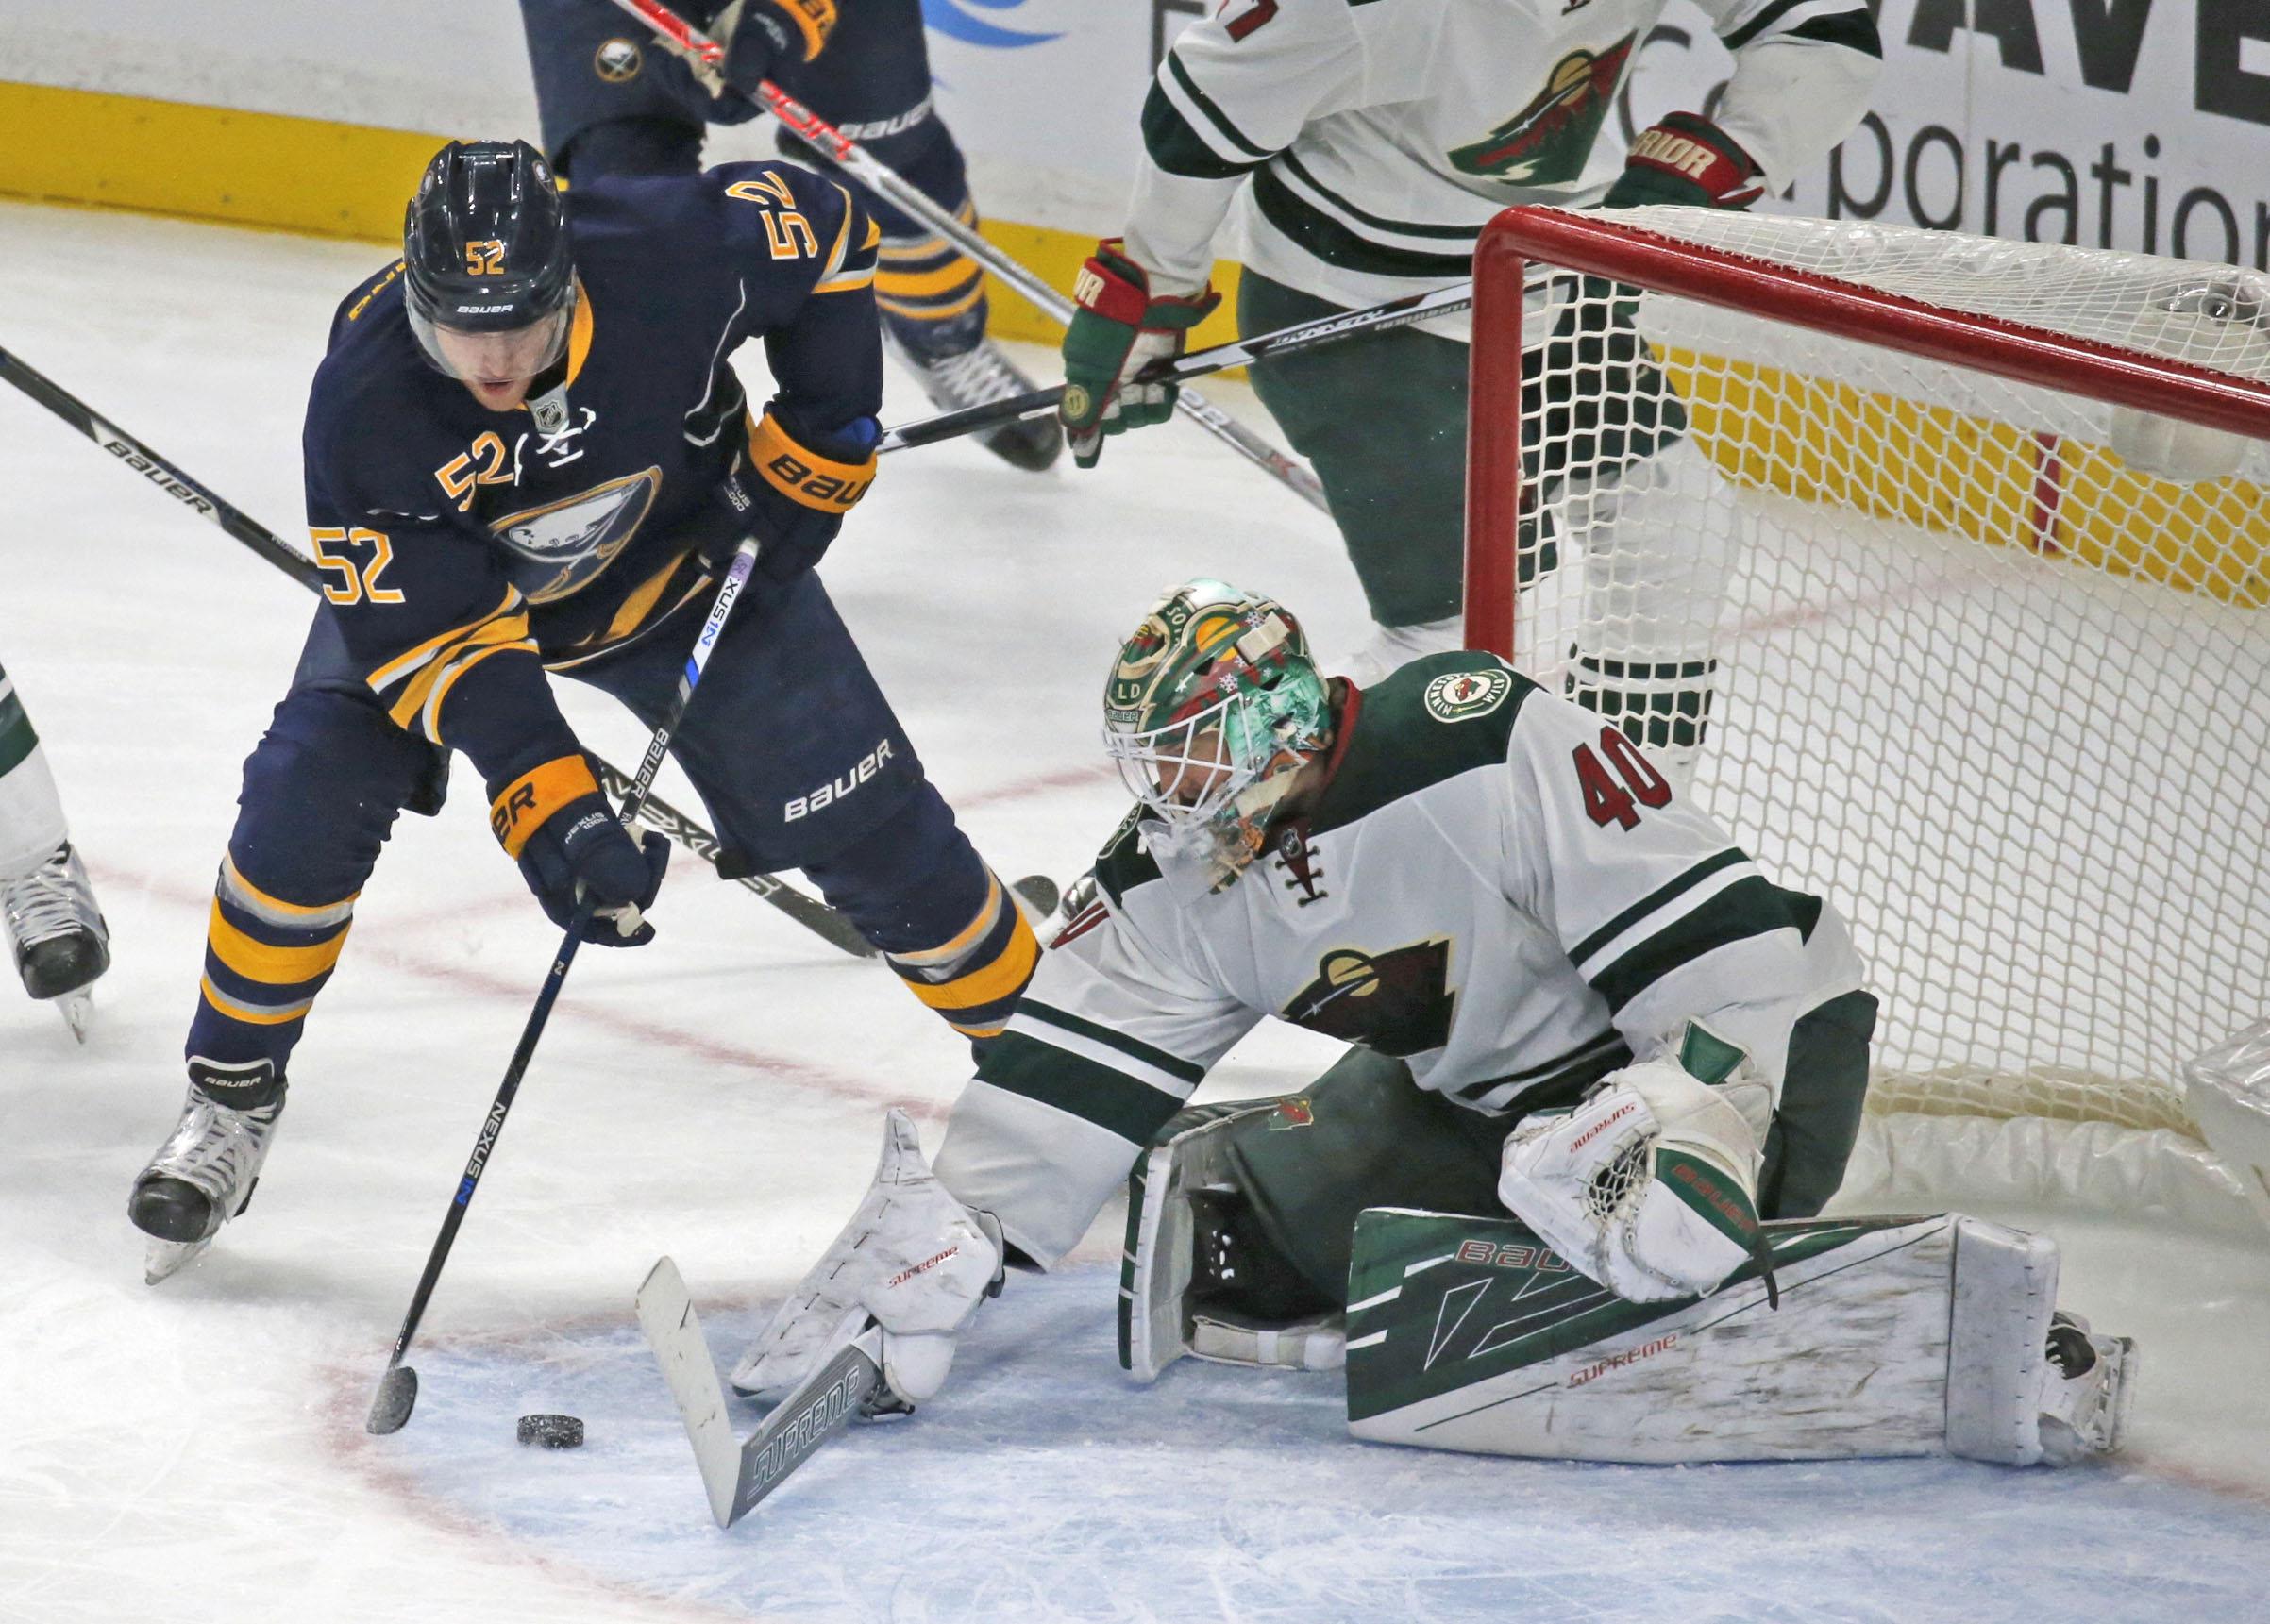 Buffalo's Hudson Fasching (52) is stopped in tight by Minnesota goalie Devan Dubnyk (Robert Kirkham/Buffalo News).